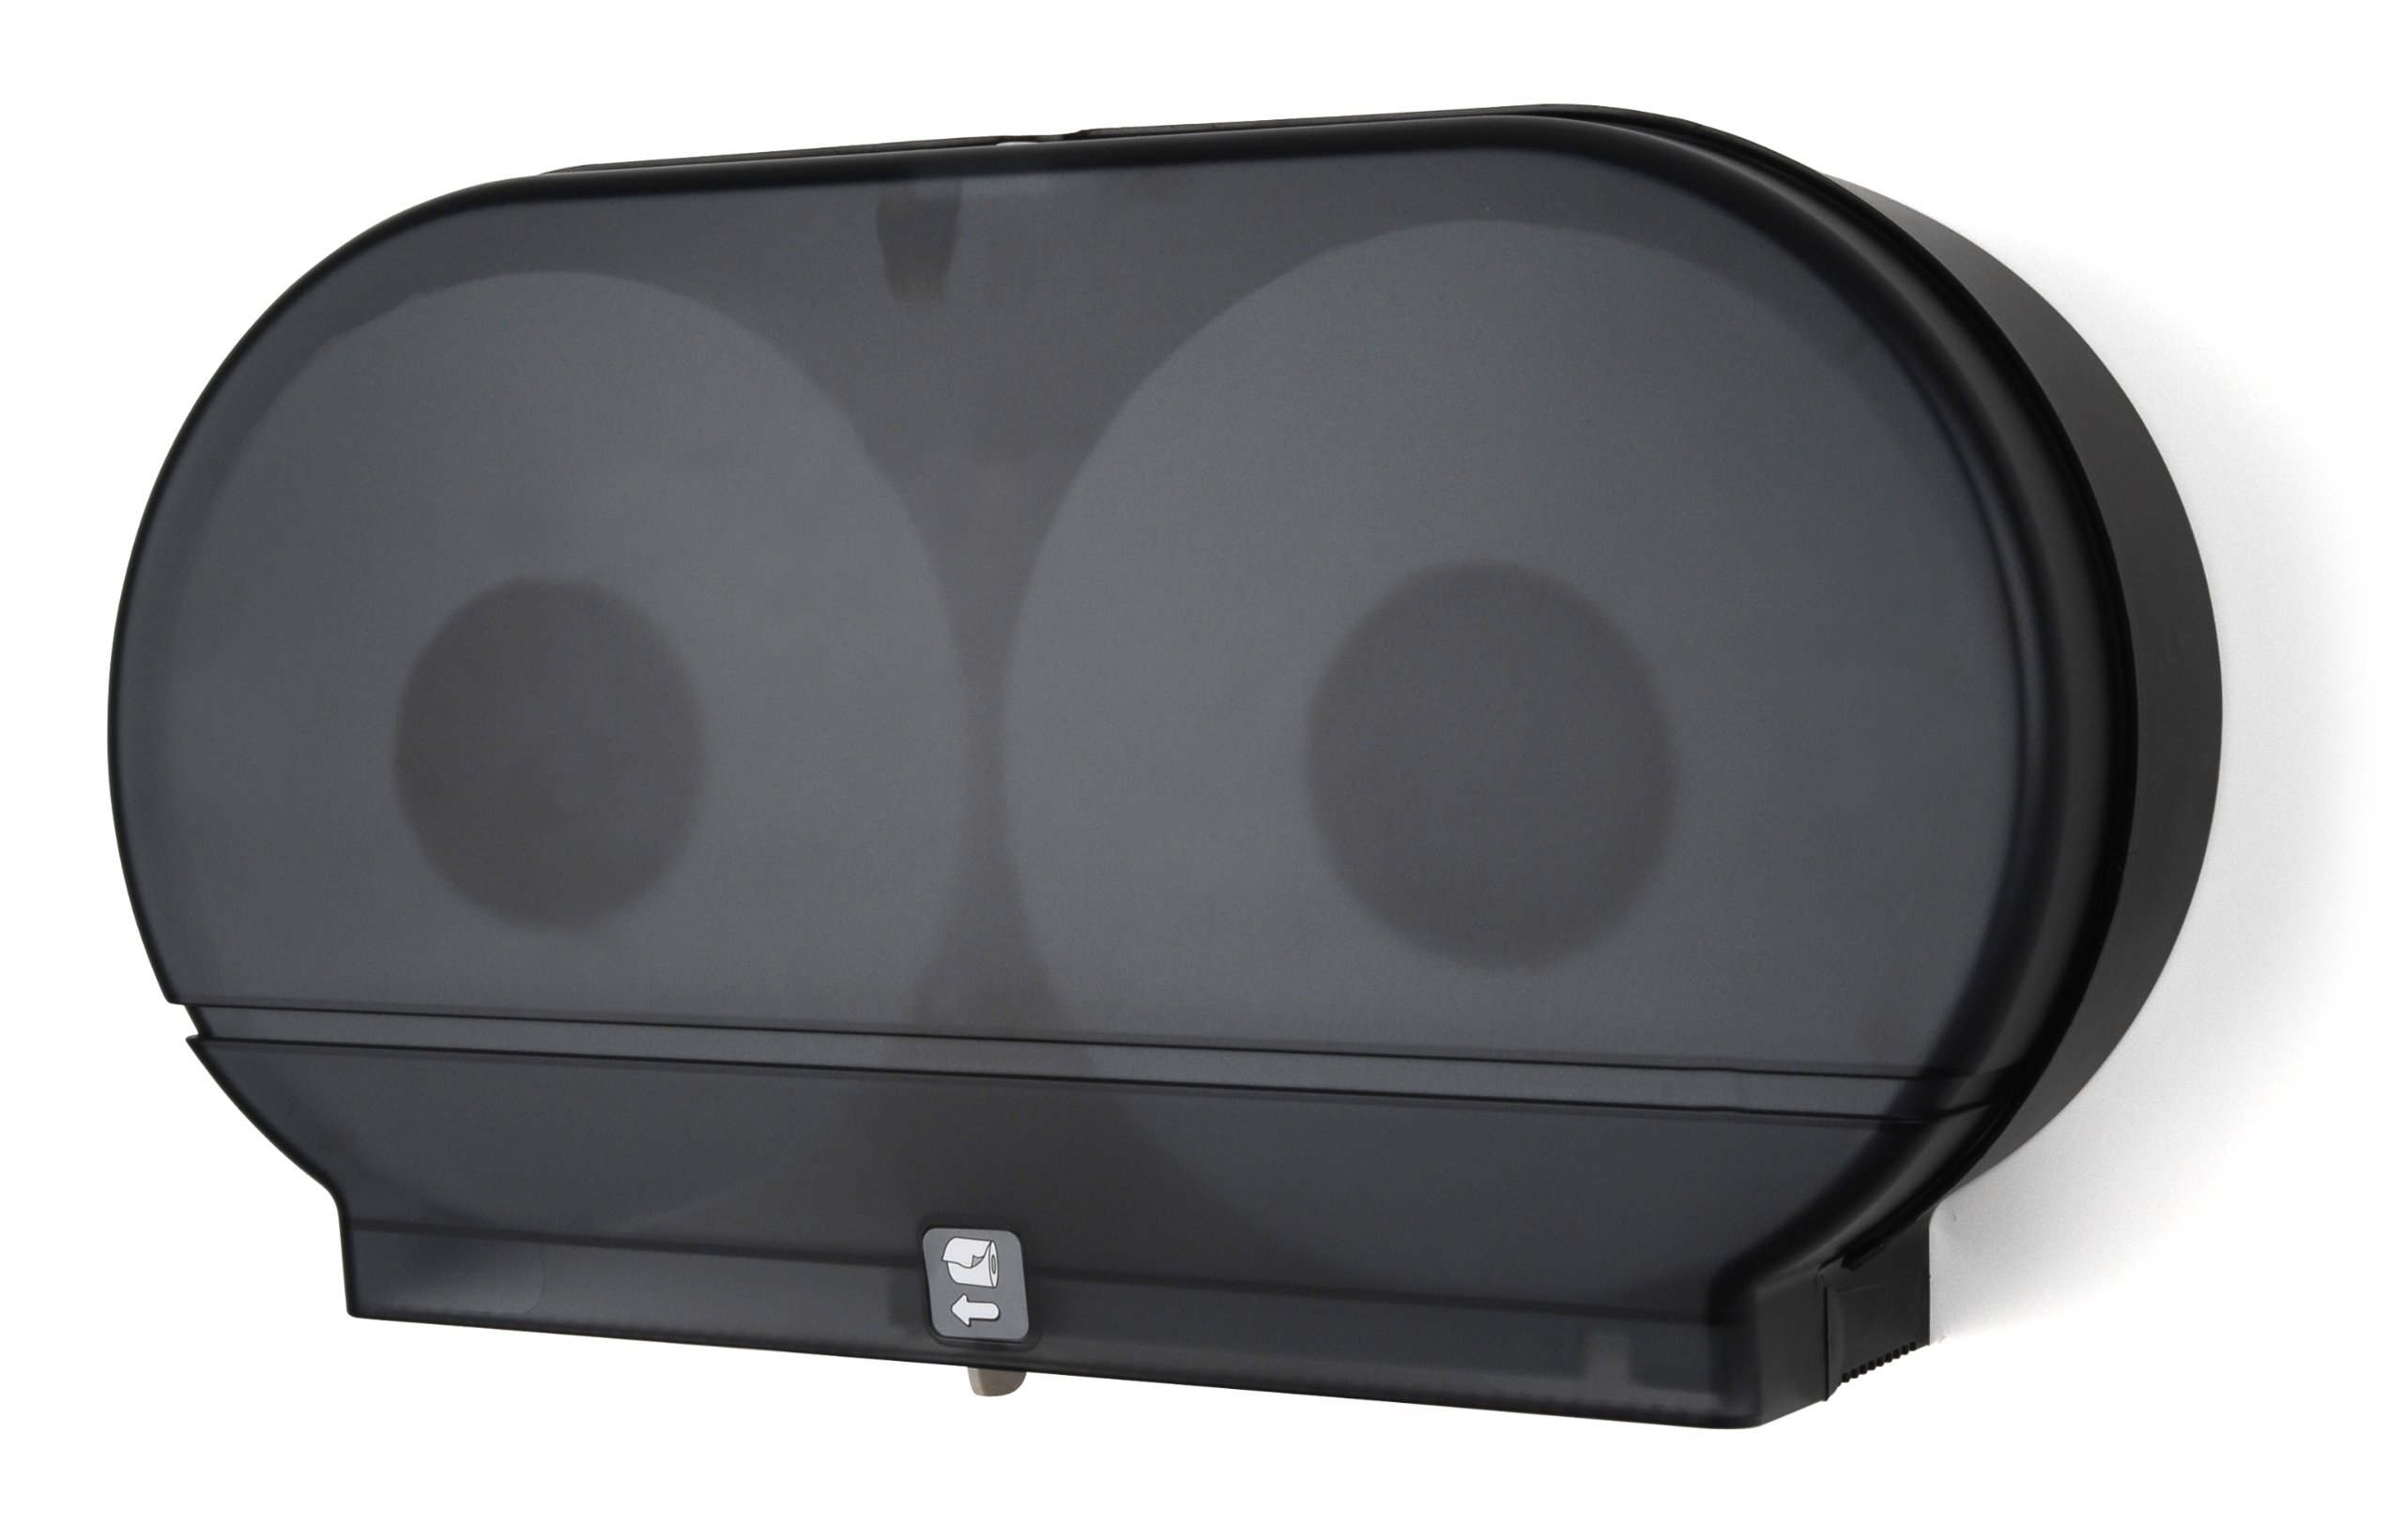 Palmer Fixture RD0027-02F Twin Jumbo Tissue Dispenser with Core Adaptor, Black Translucent